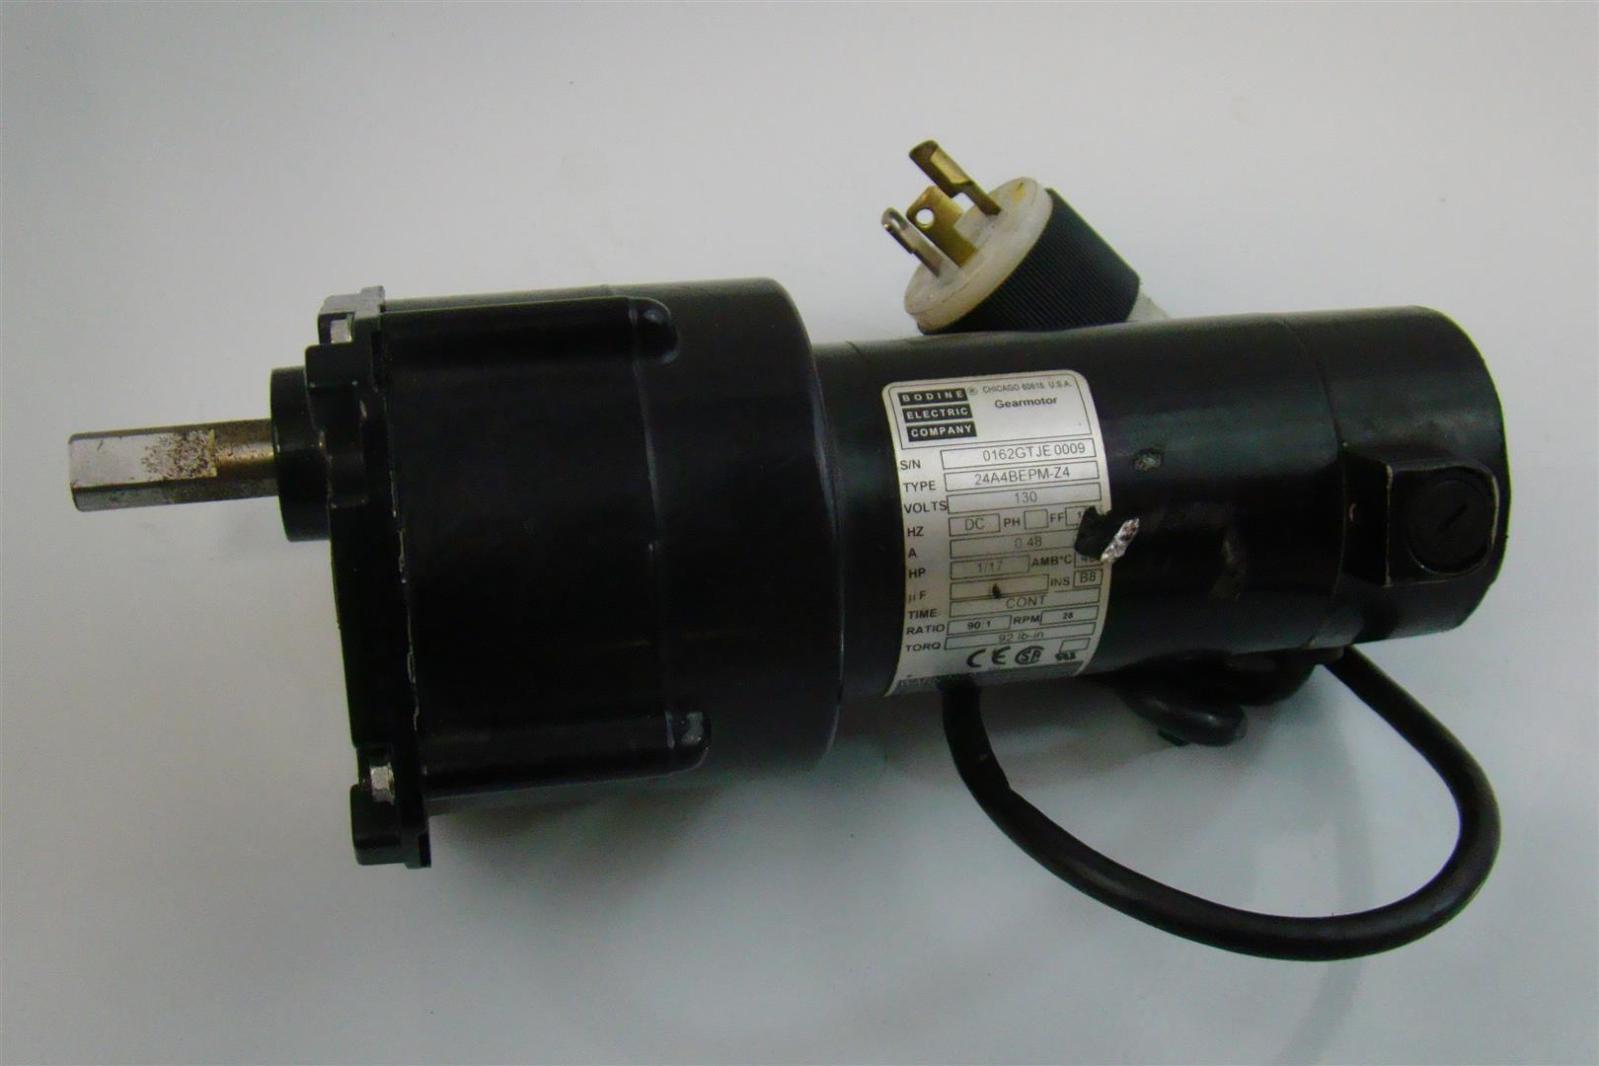 Bodine Electric Company Gear Motor 130v 1 17hp 24a4bepm Za